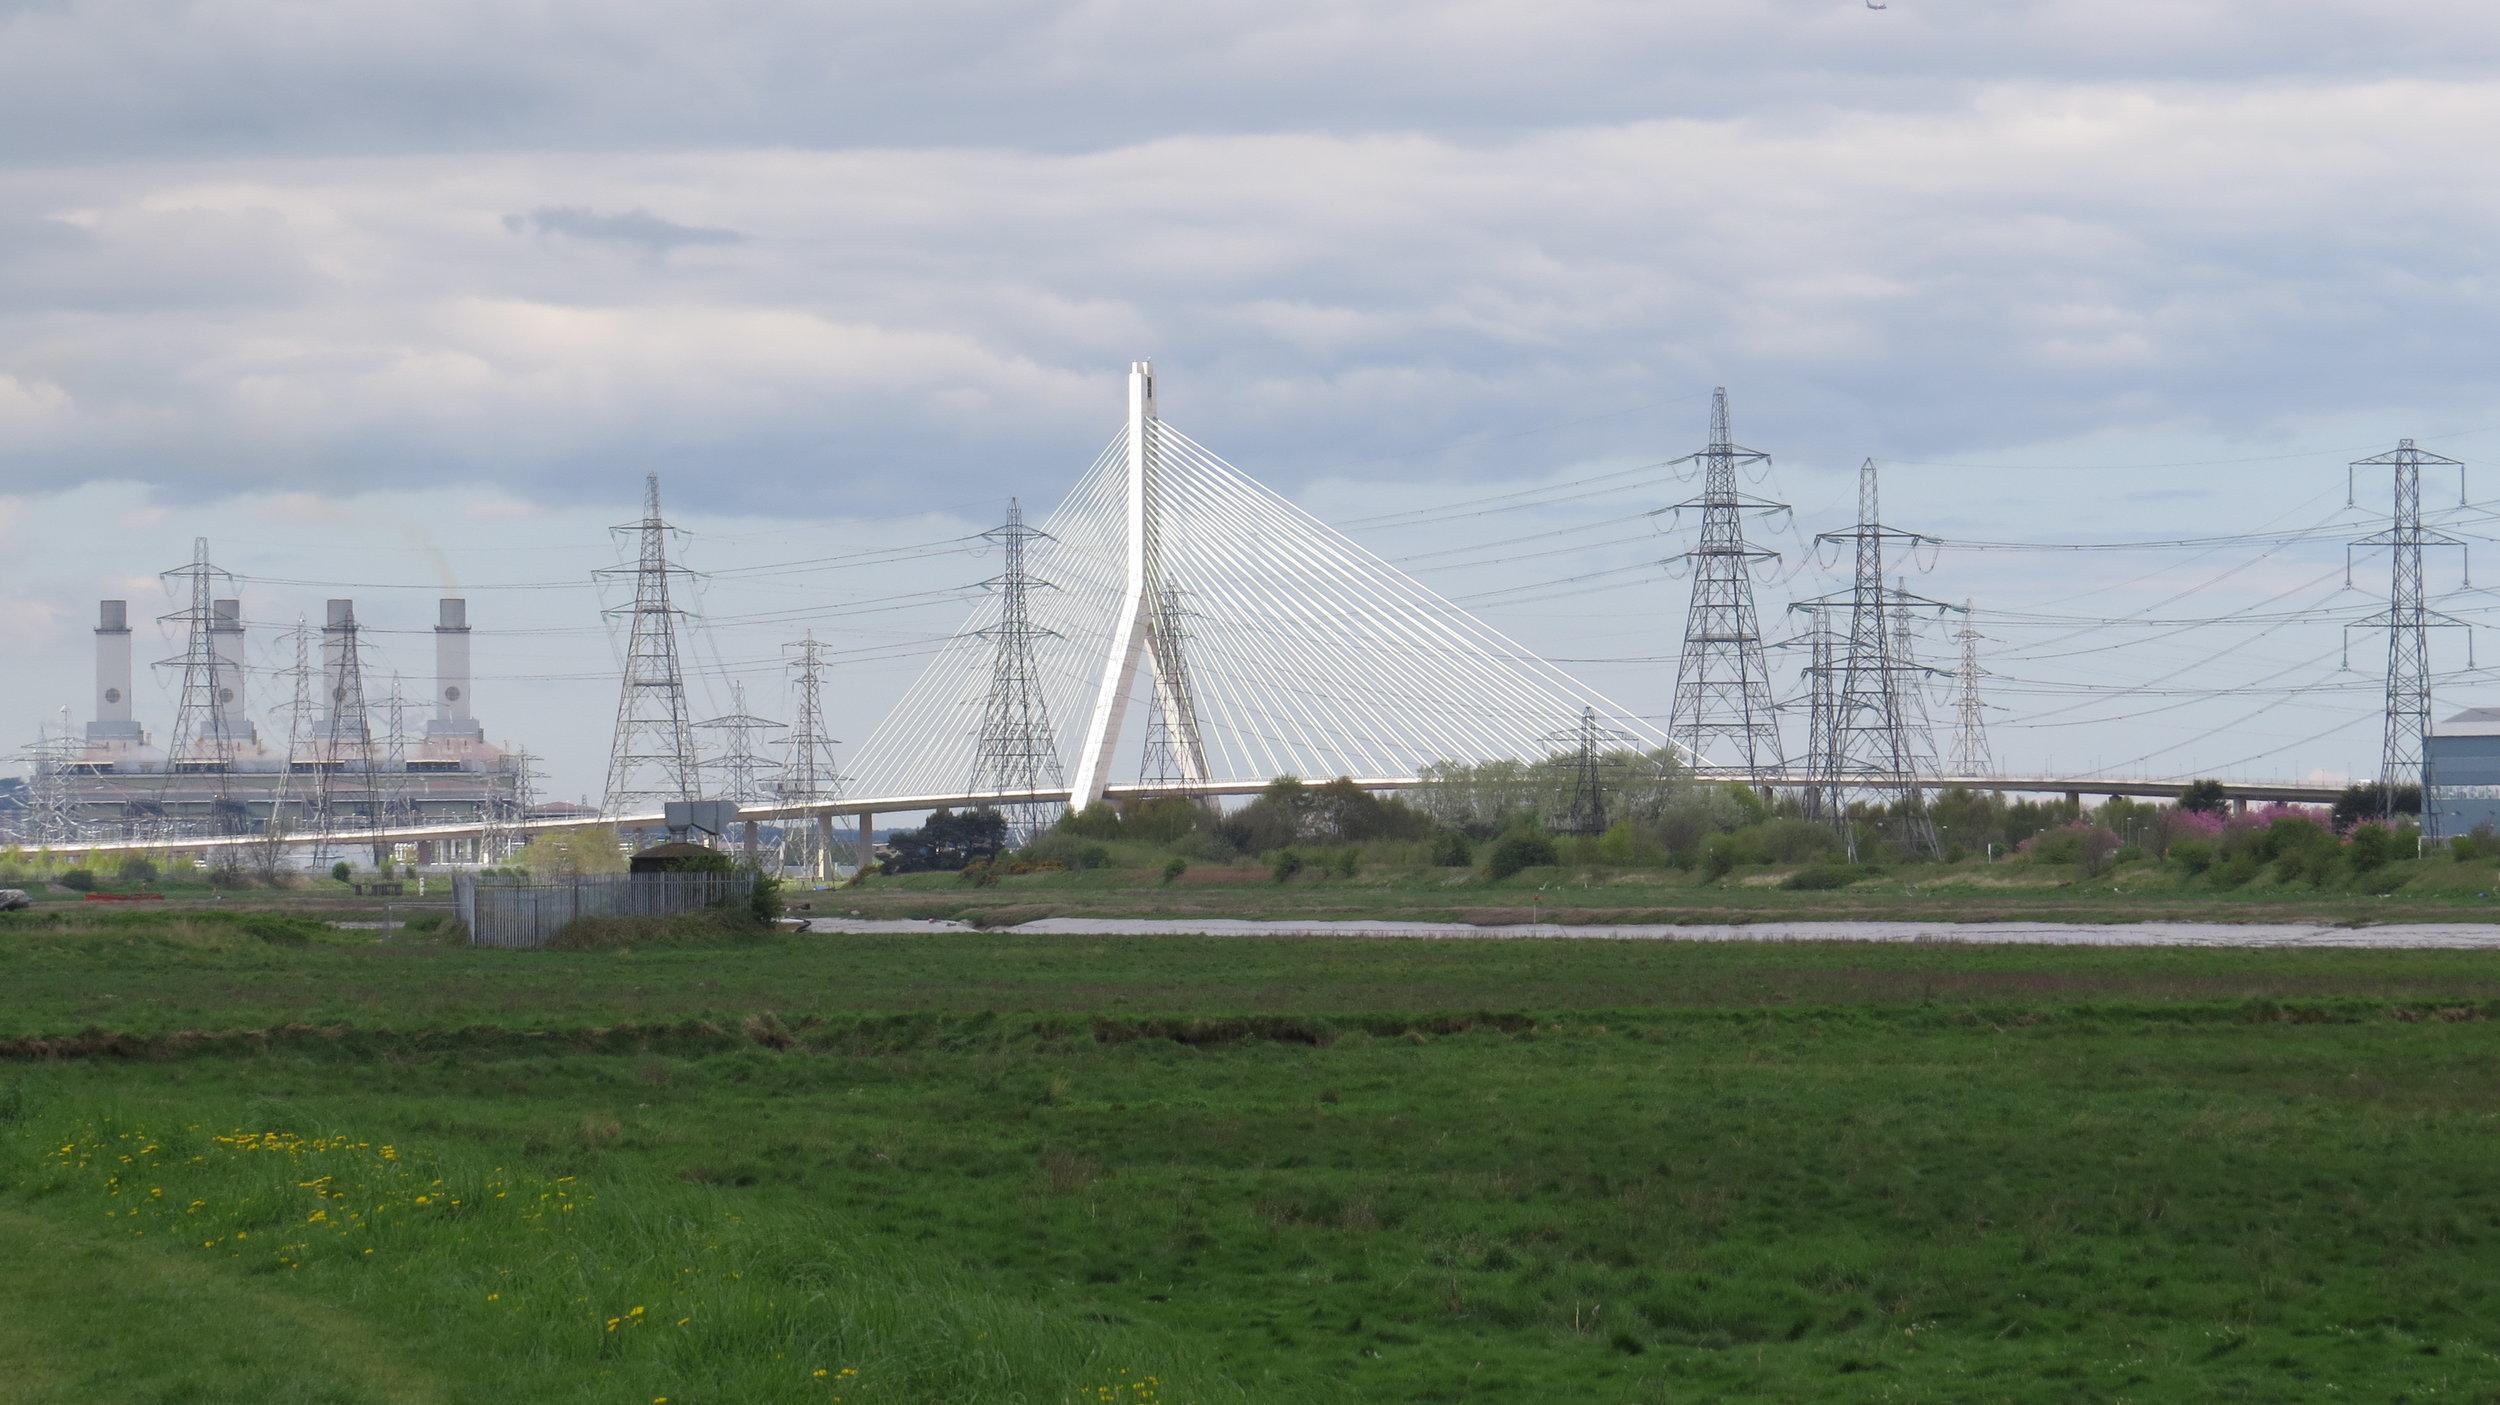 Flintshire Bridge amongst Pylons